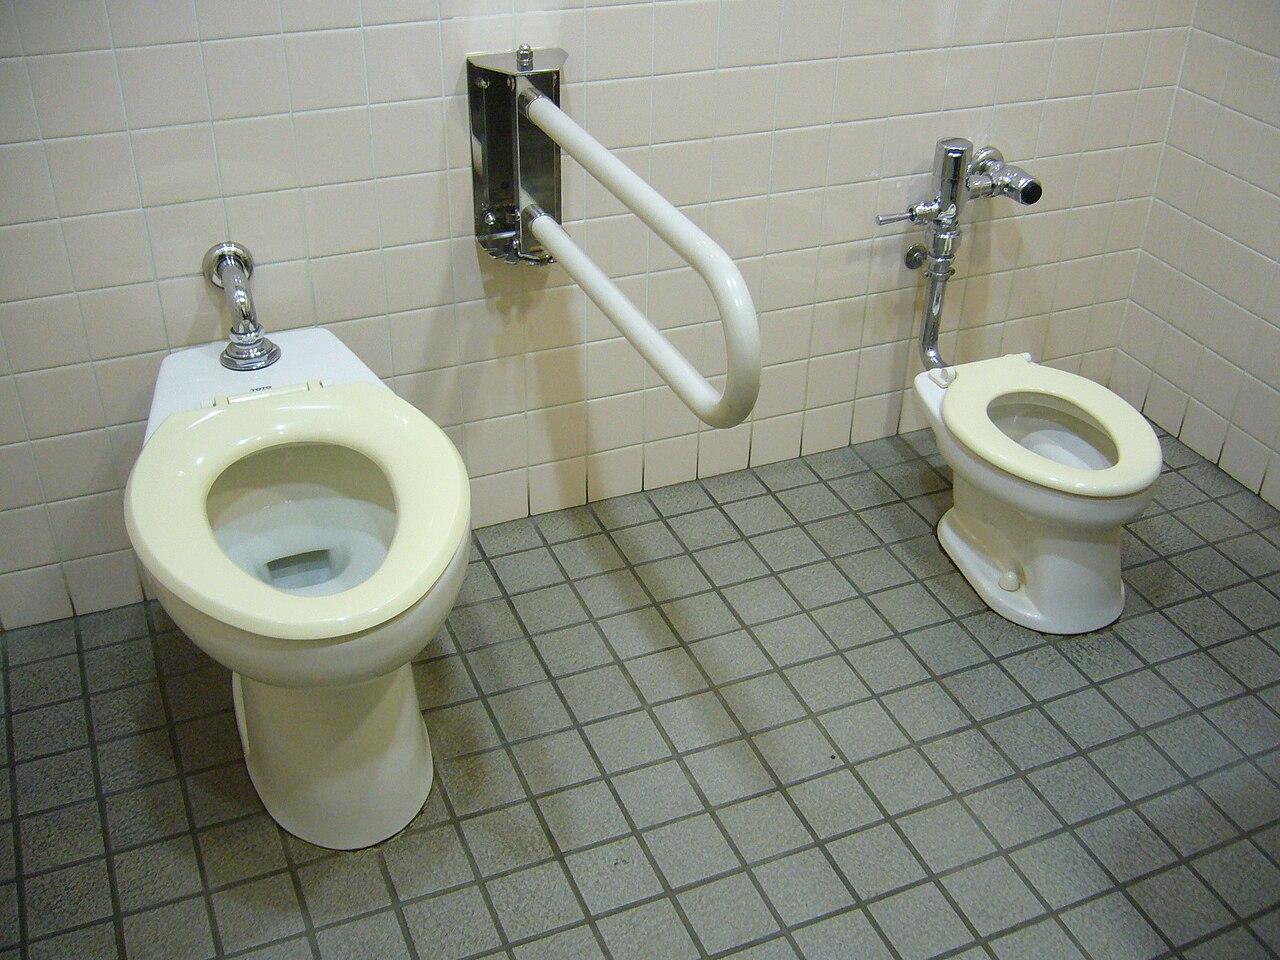 File:Toilet ordinary&child,child-benki,japan.JPG - Wikimedia Commons